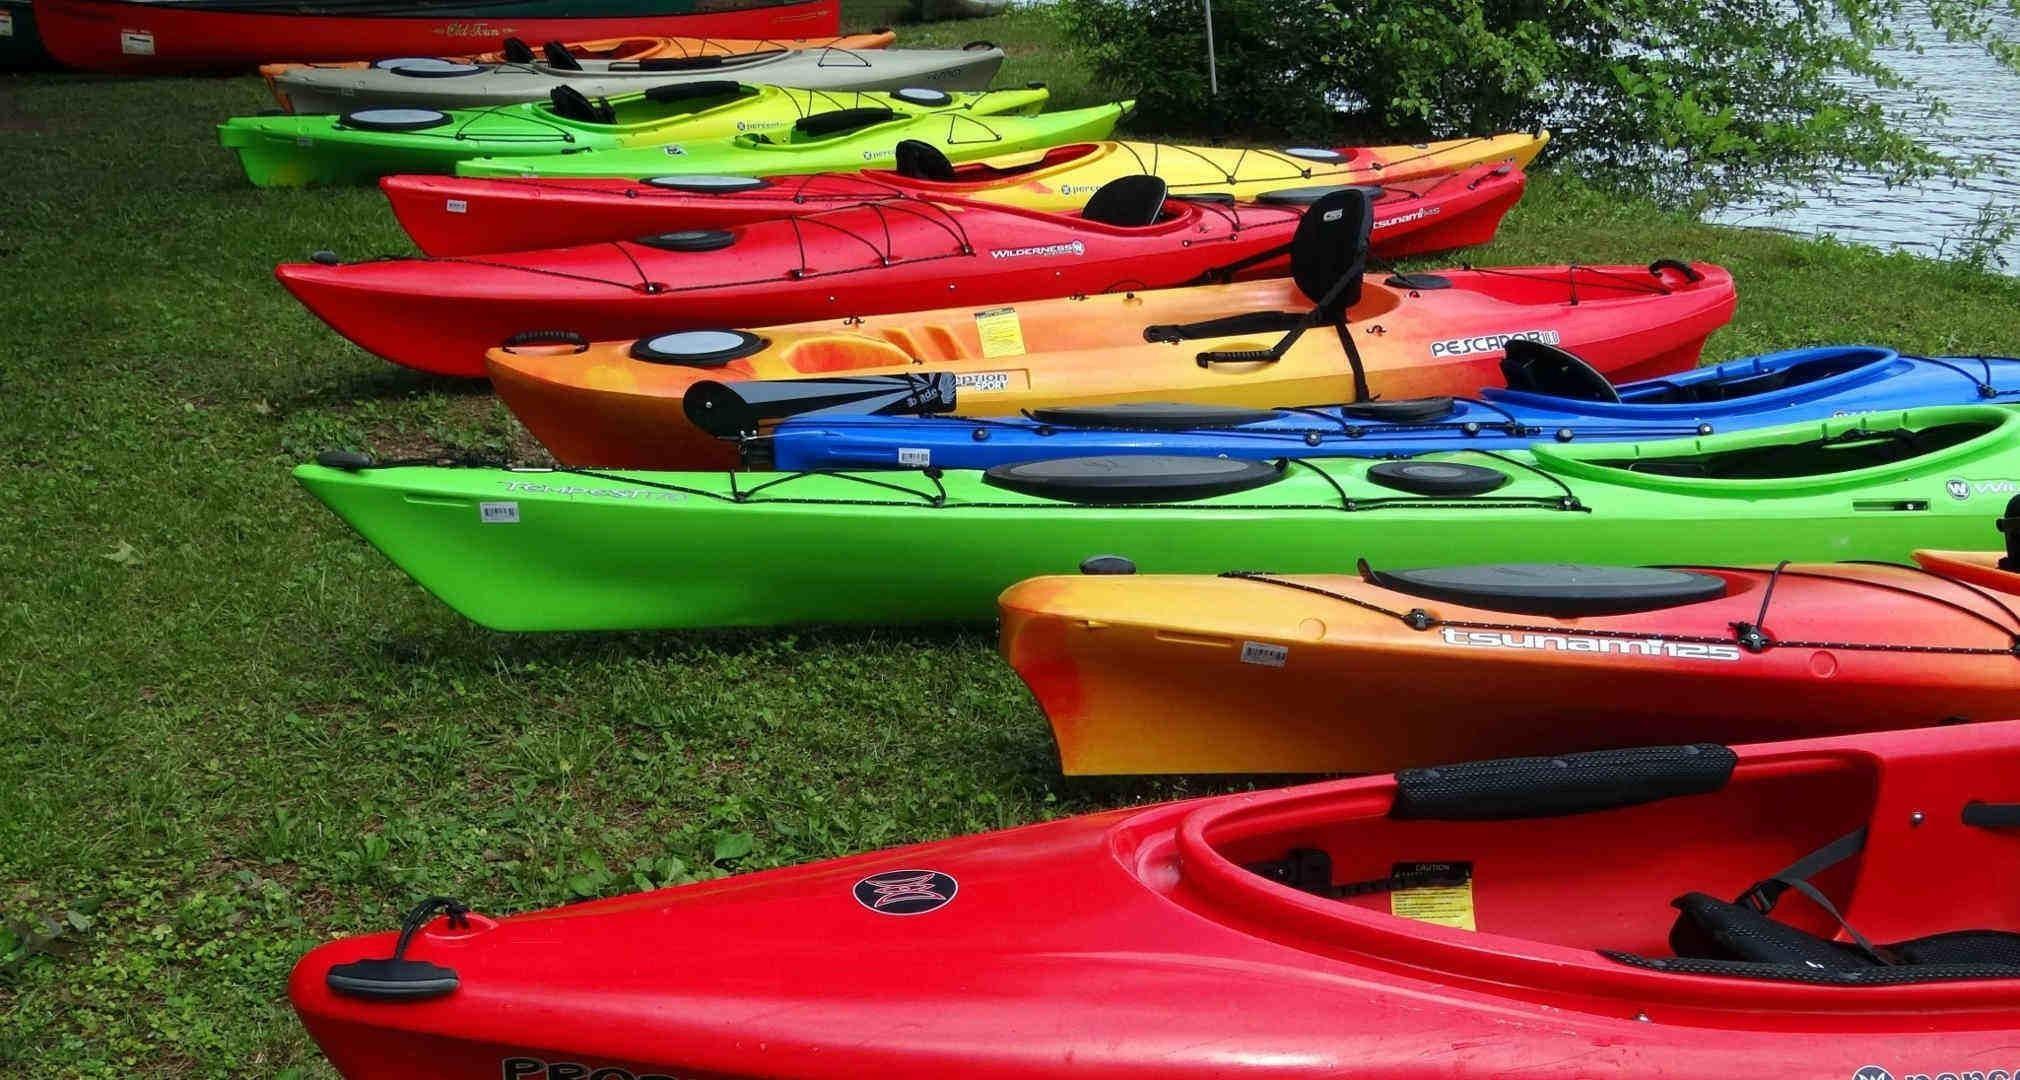 Kayaks de mar, kayaks de pesca, kayaks de recreo, piraguas de aguas bravas